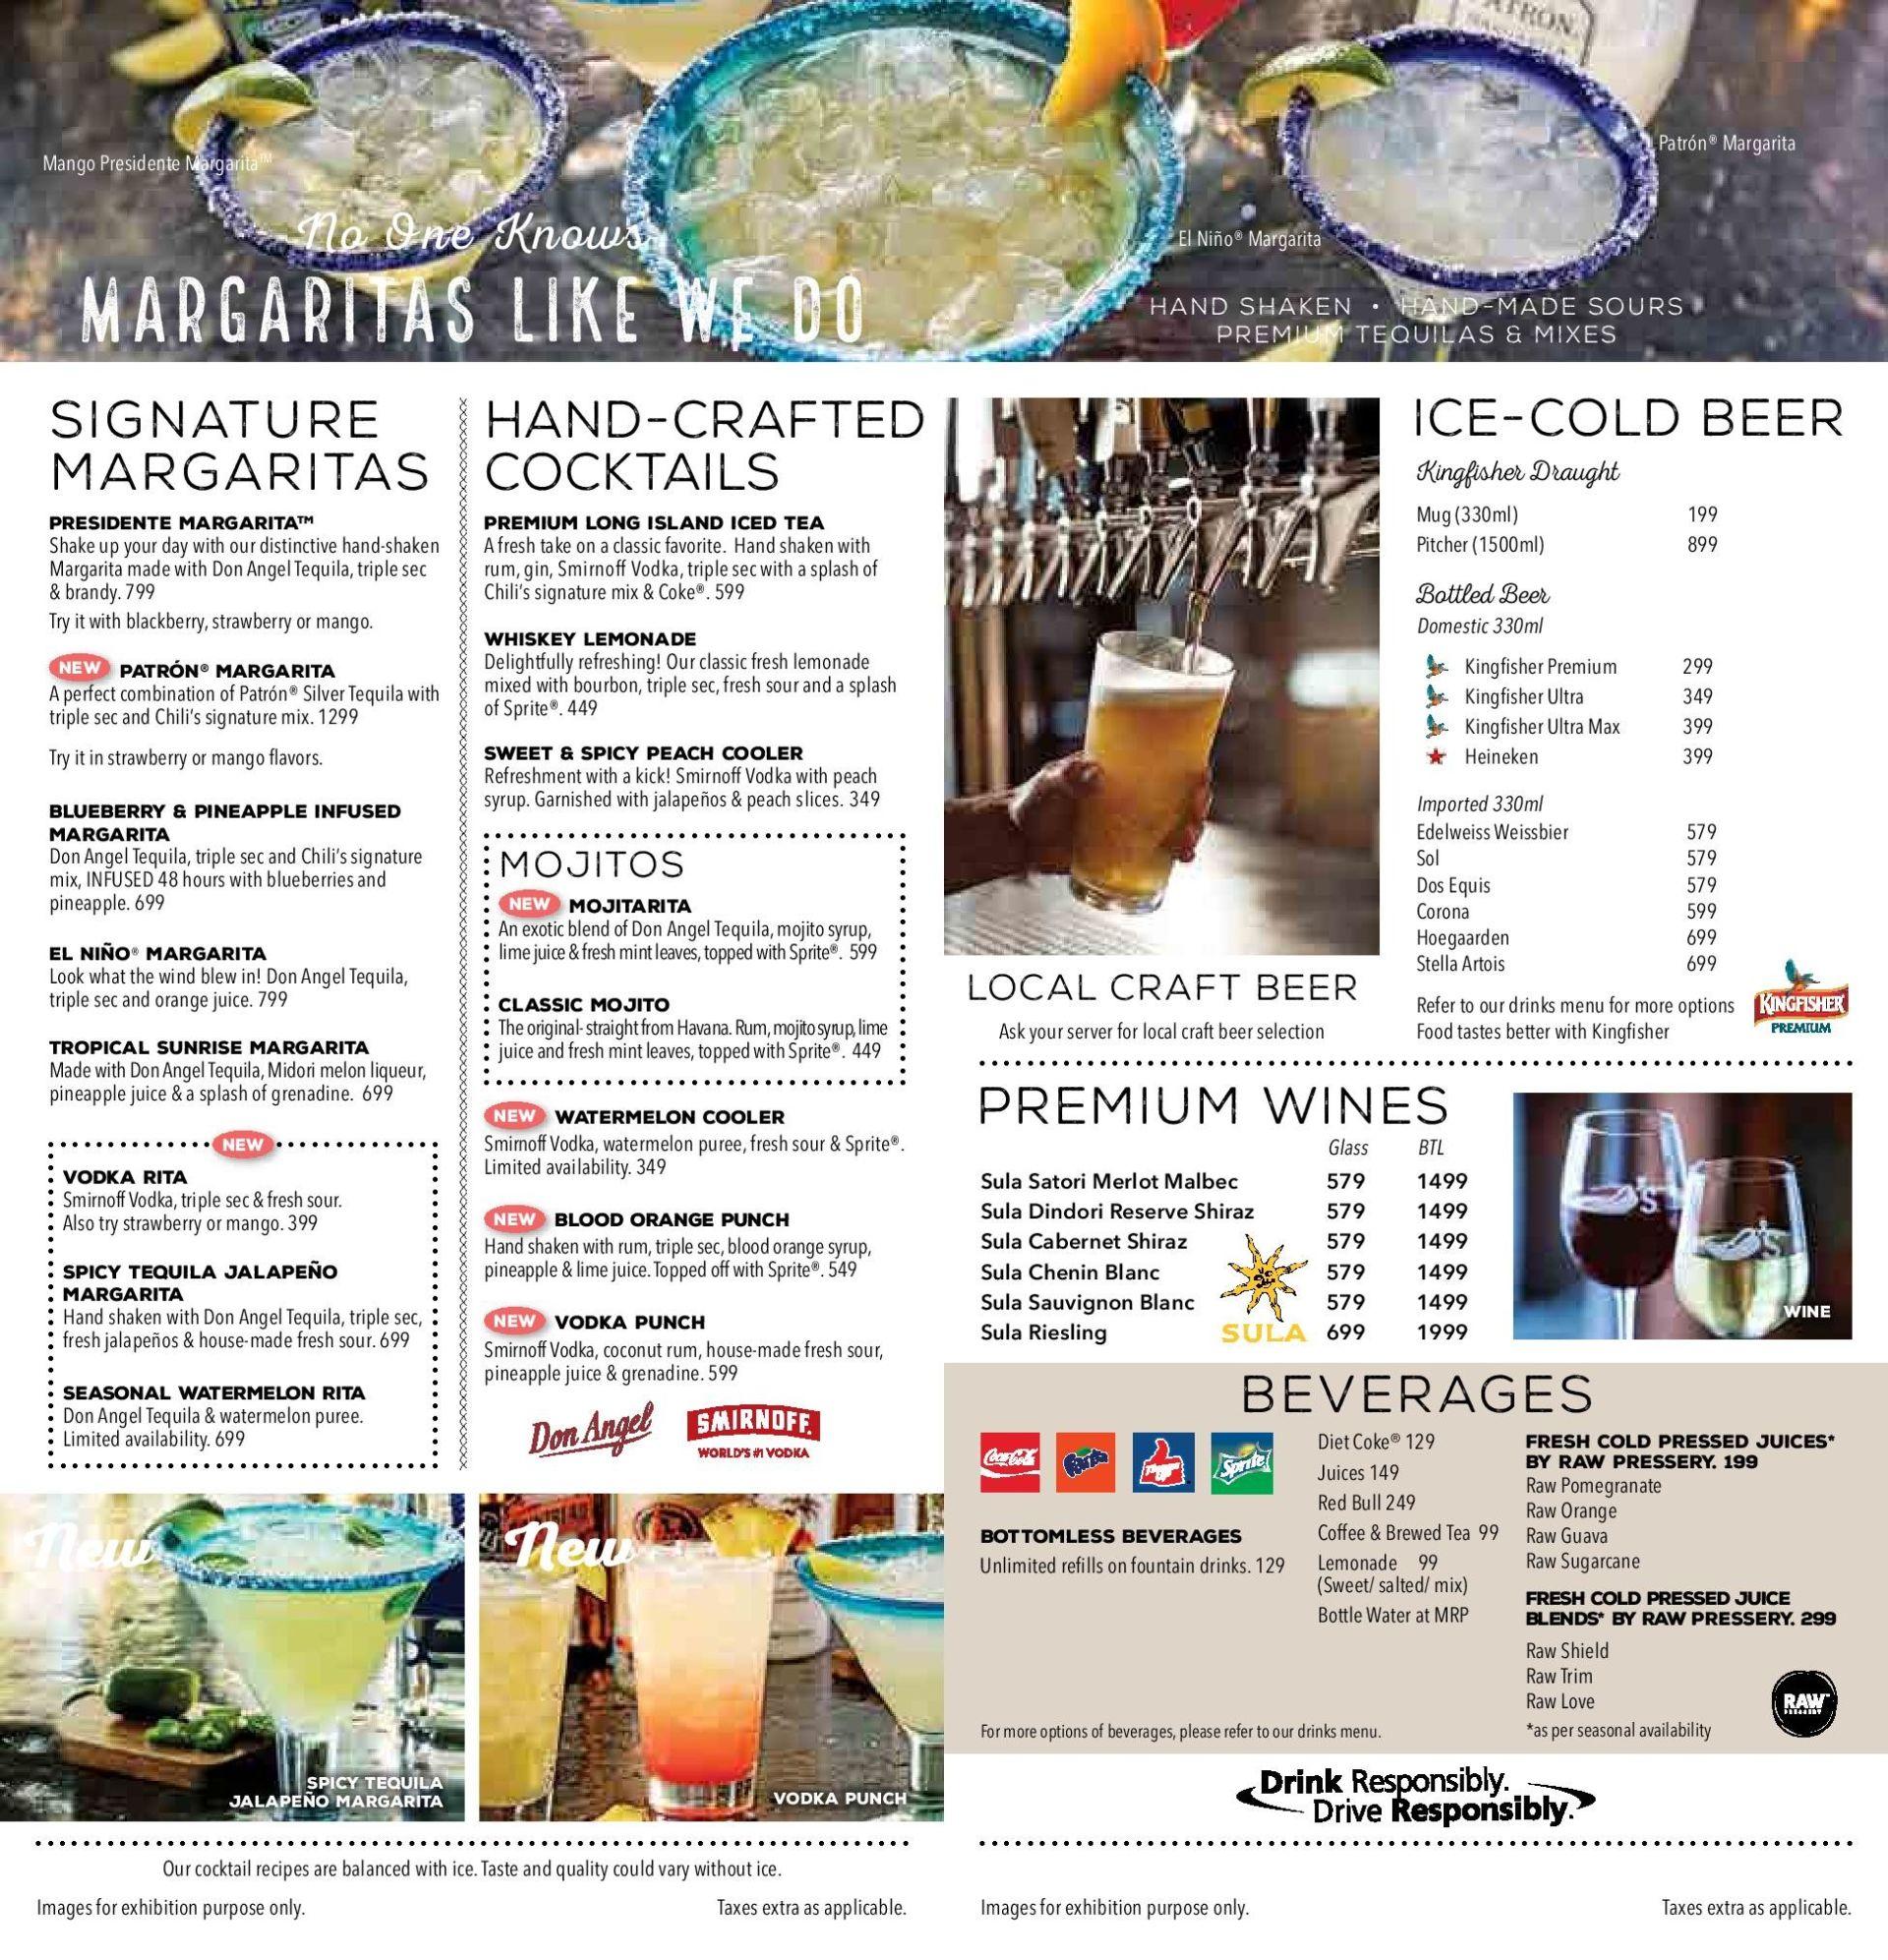 Menu of the Chili's American Grill & Bar